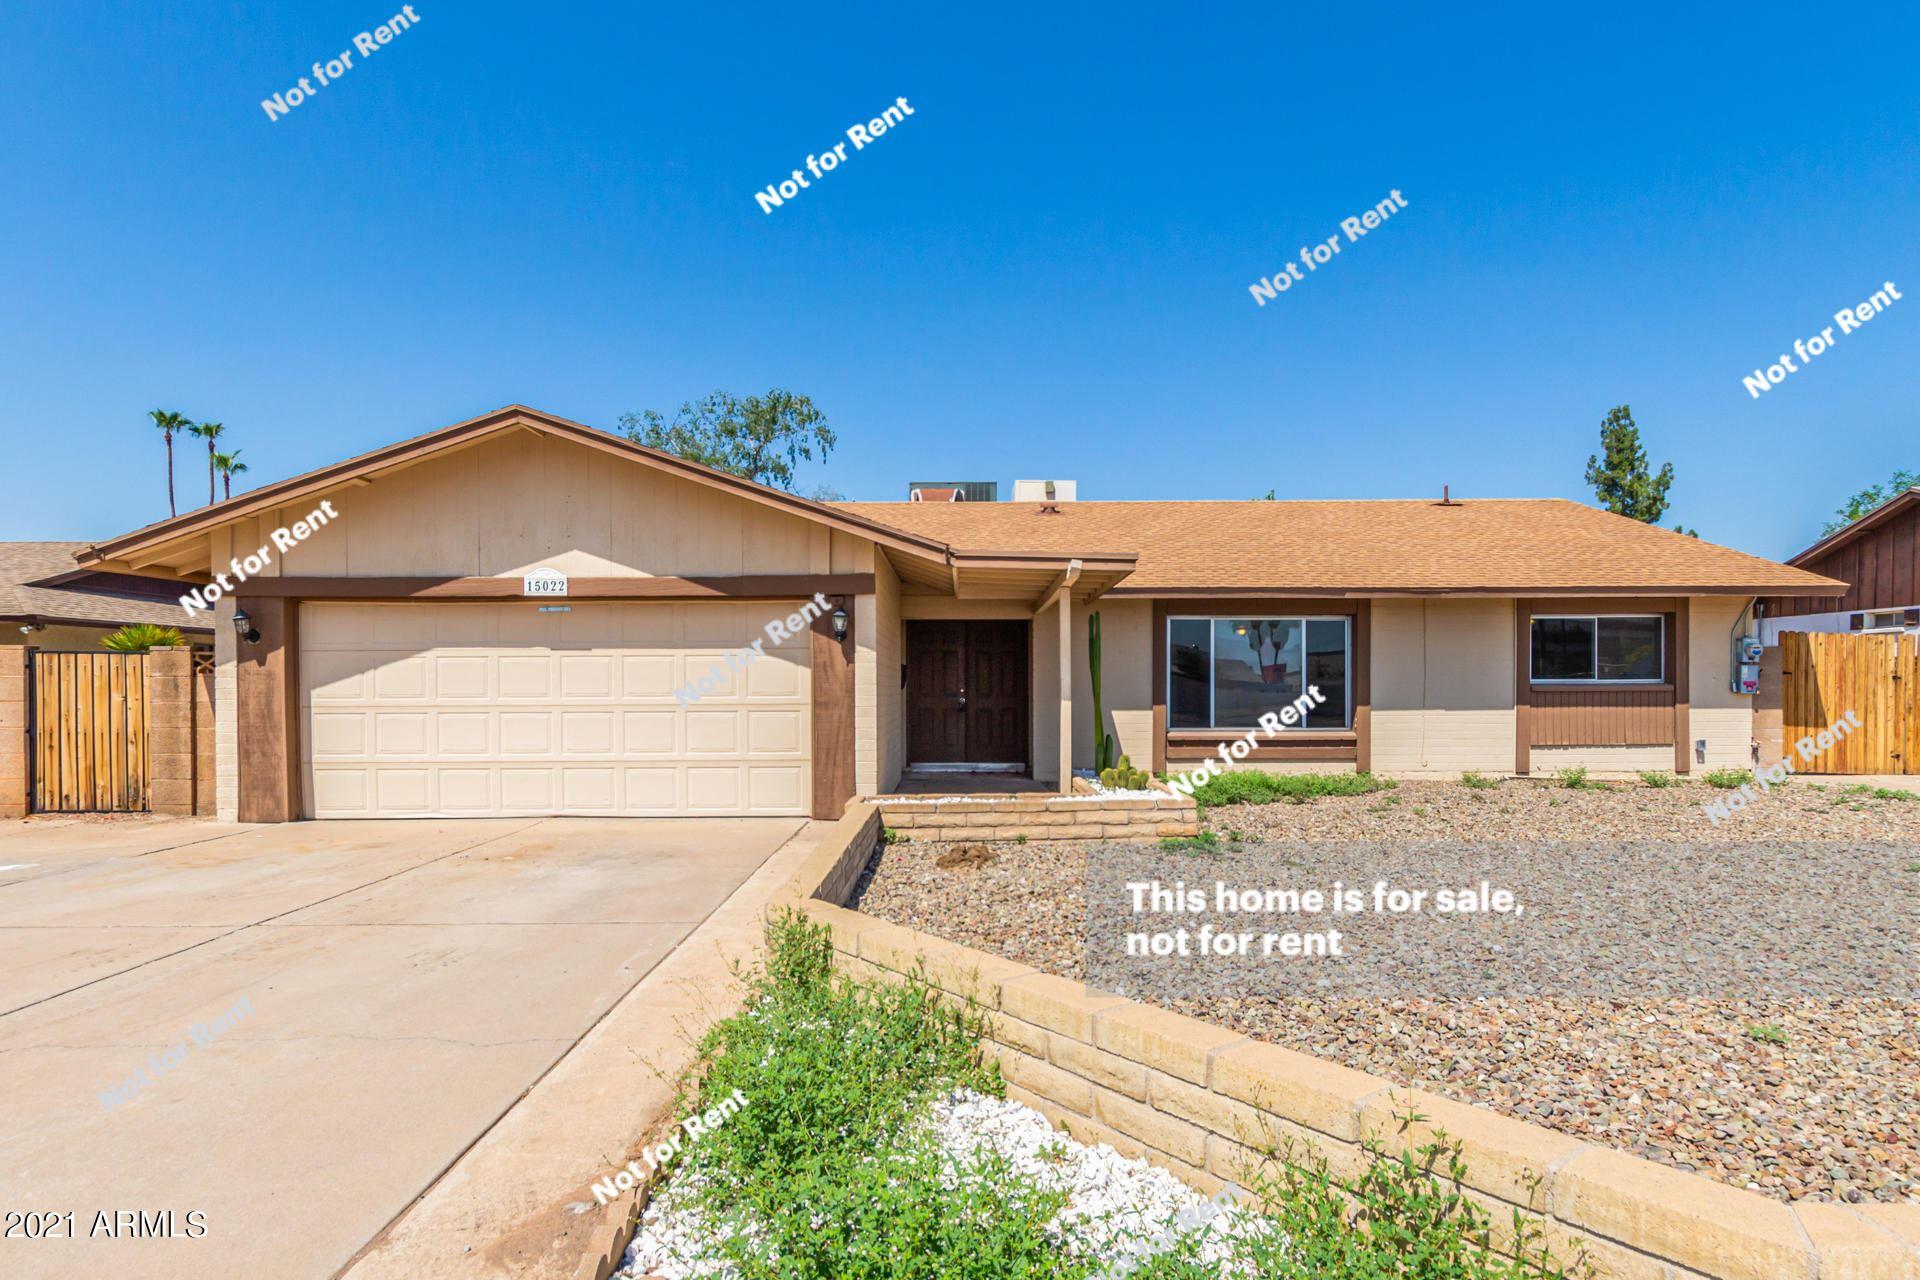 15022 N 35TH Avenue, Phoenix, AZ 85053 - MLS#: 6279409